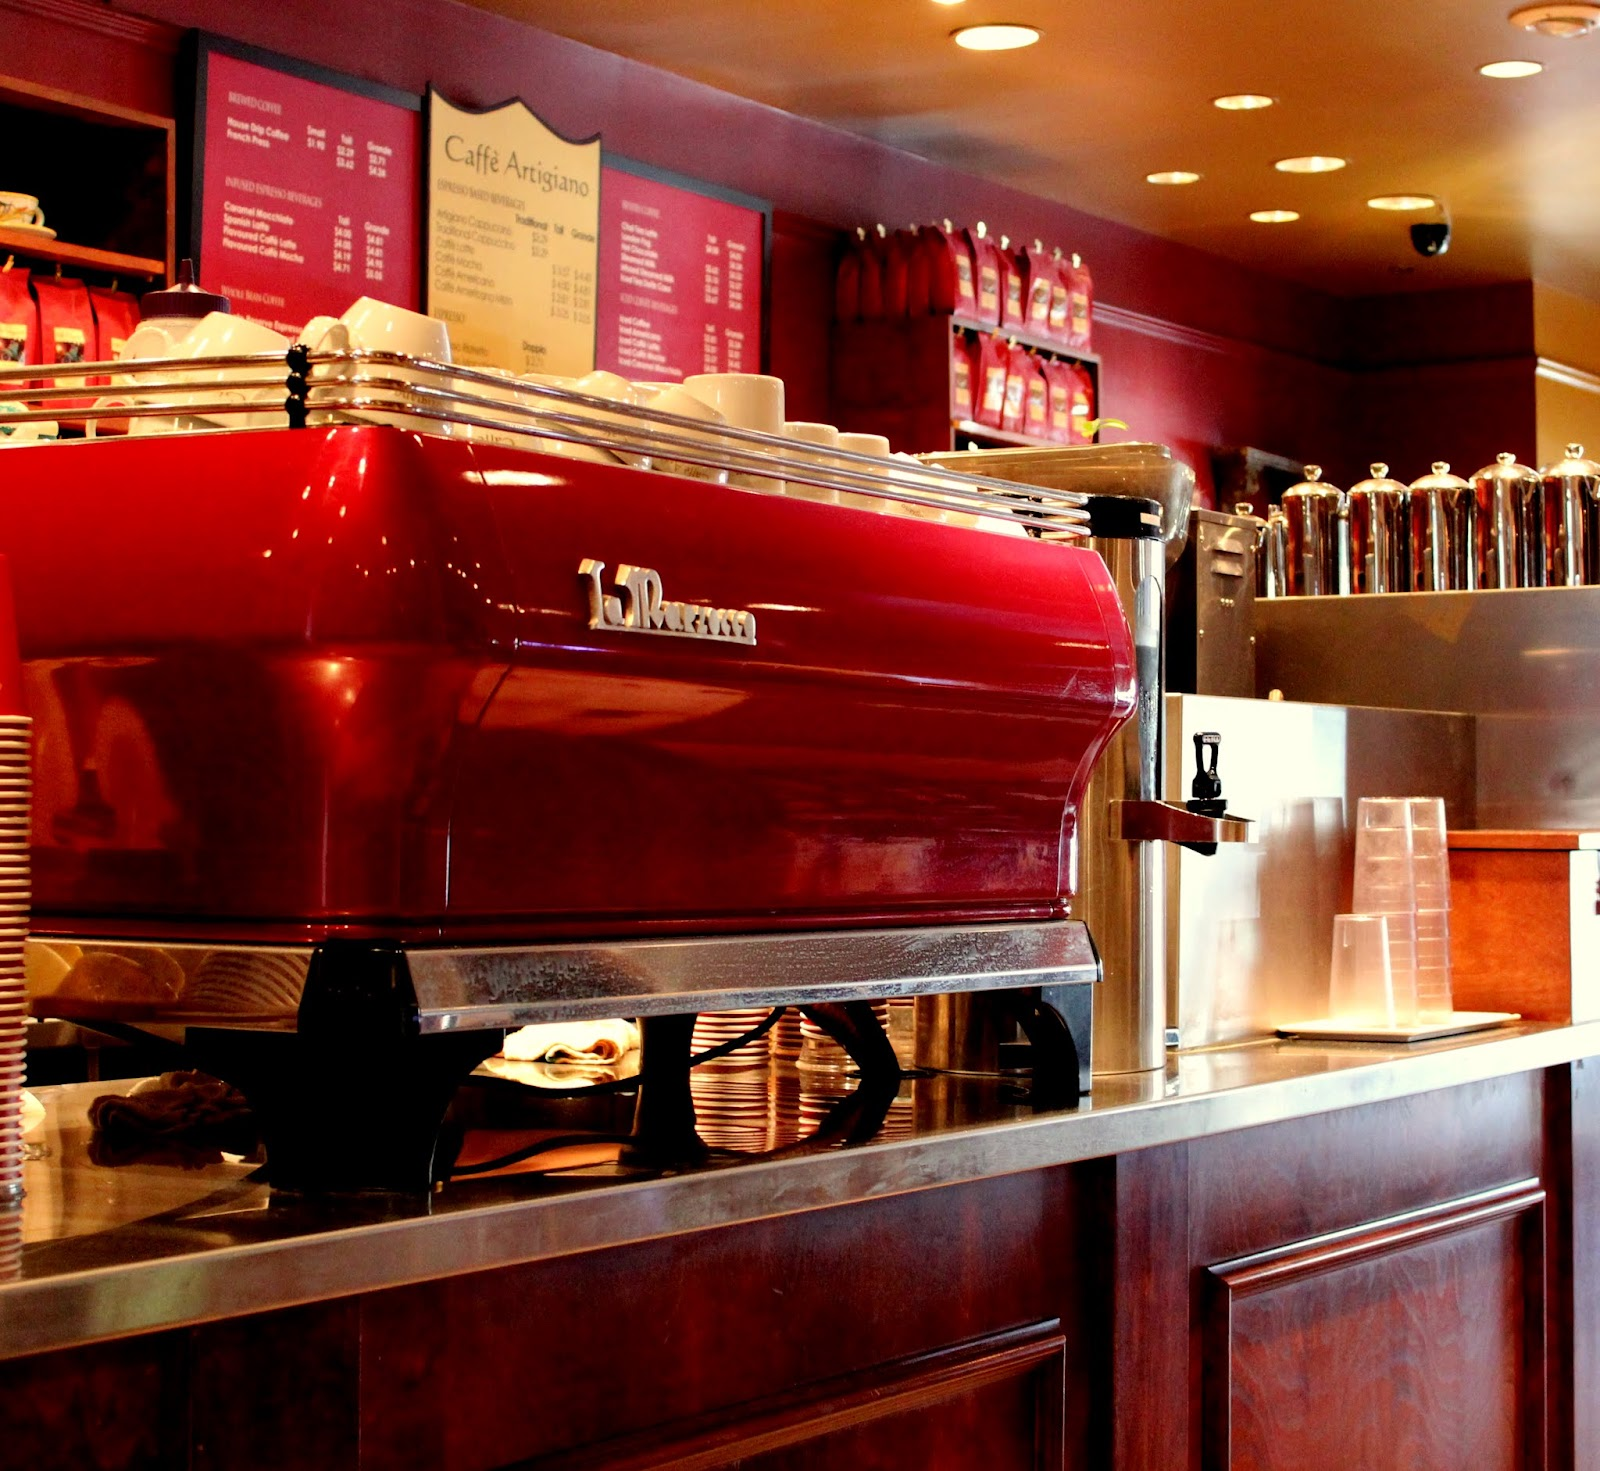 local coffee shops and chain coffee